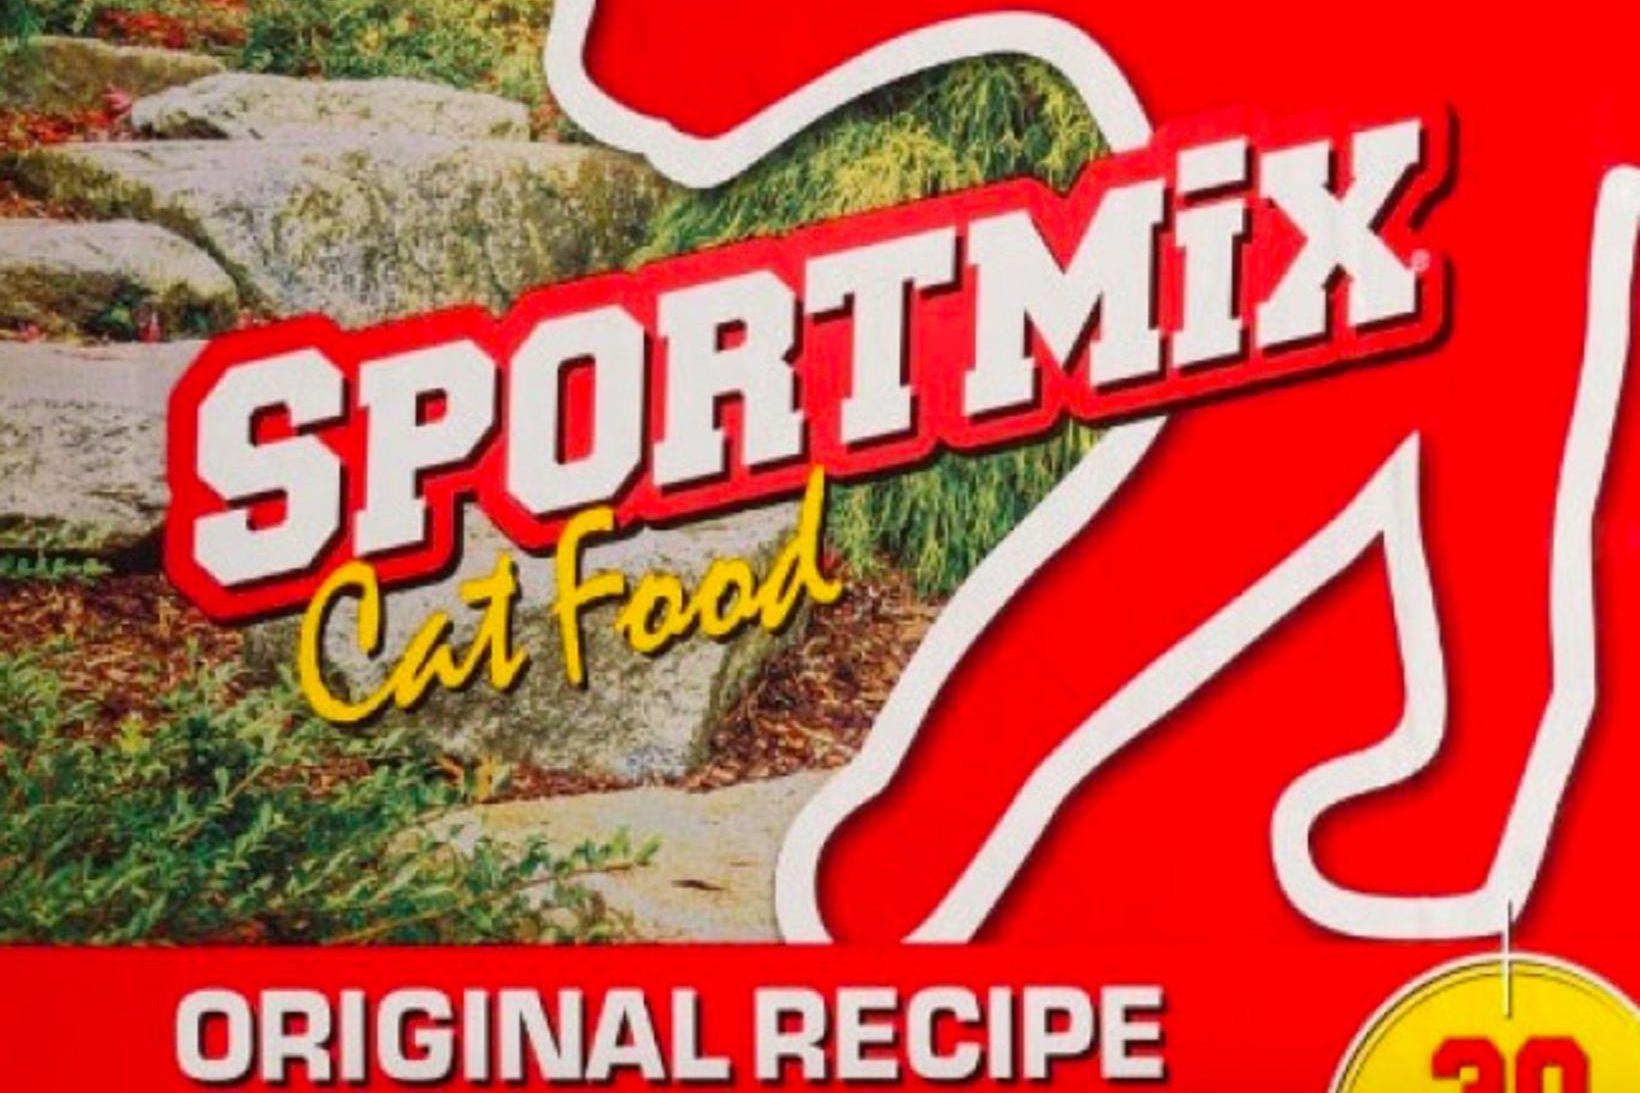 Sportmix original cat food.